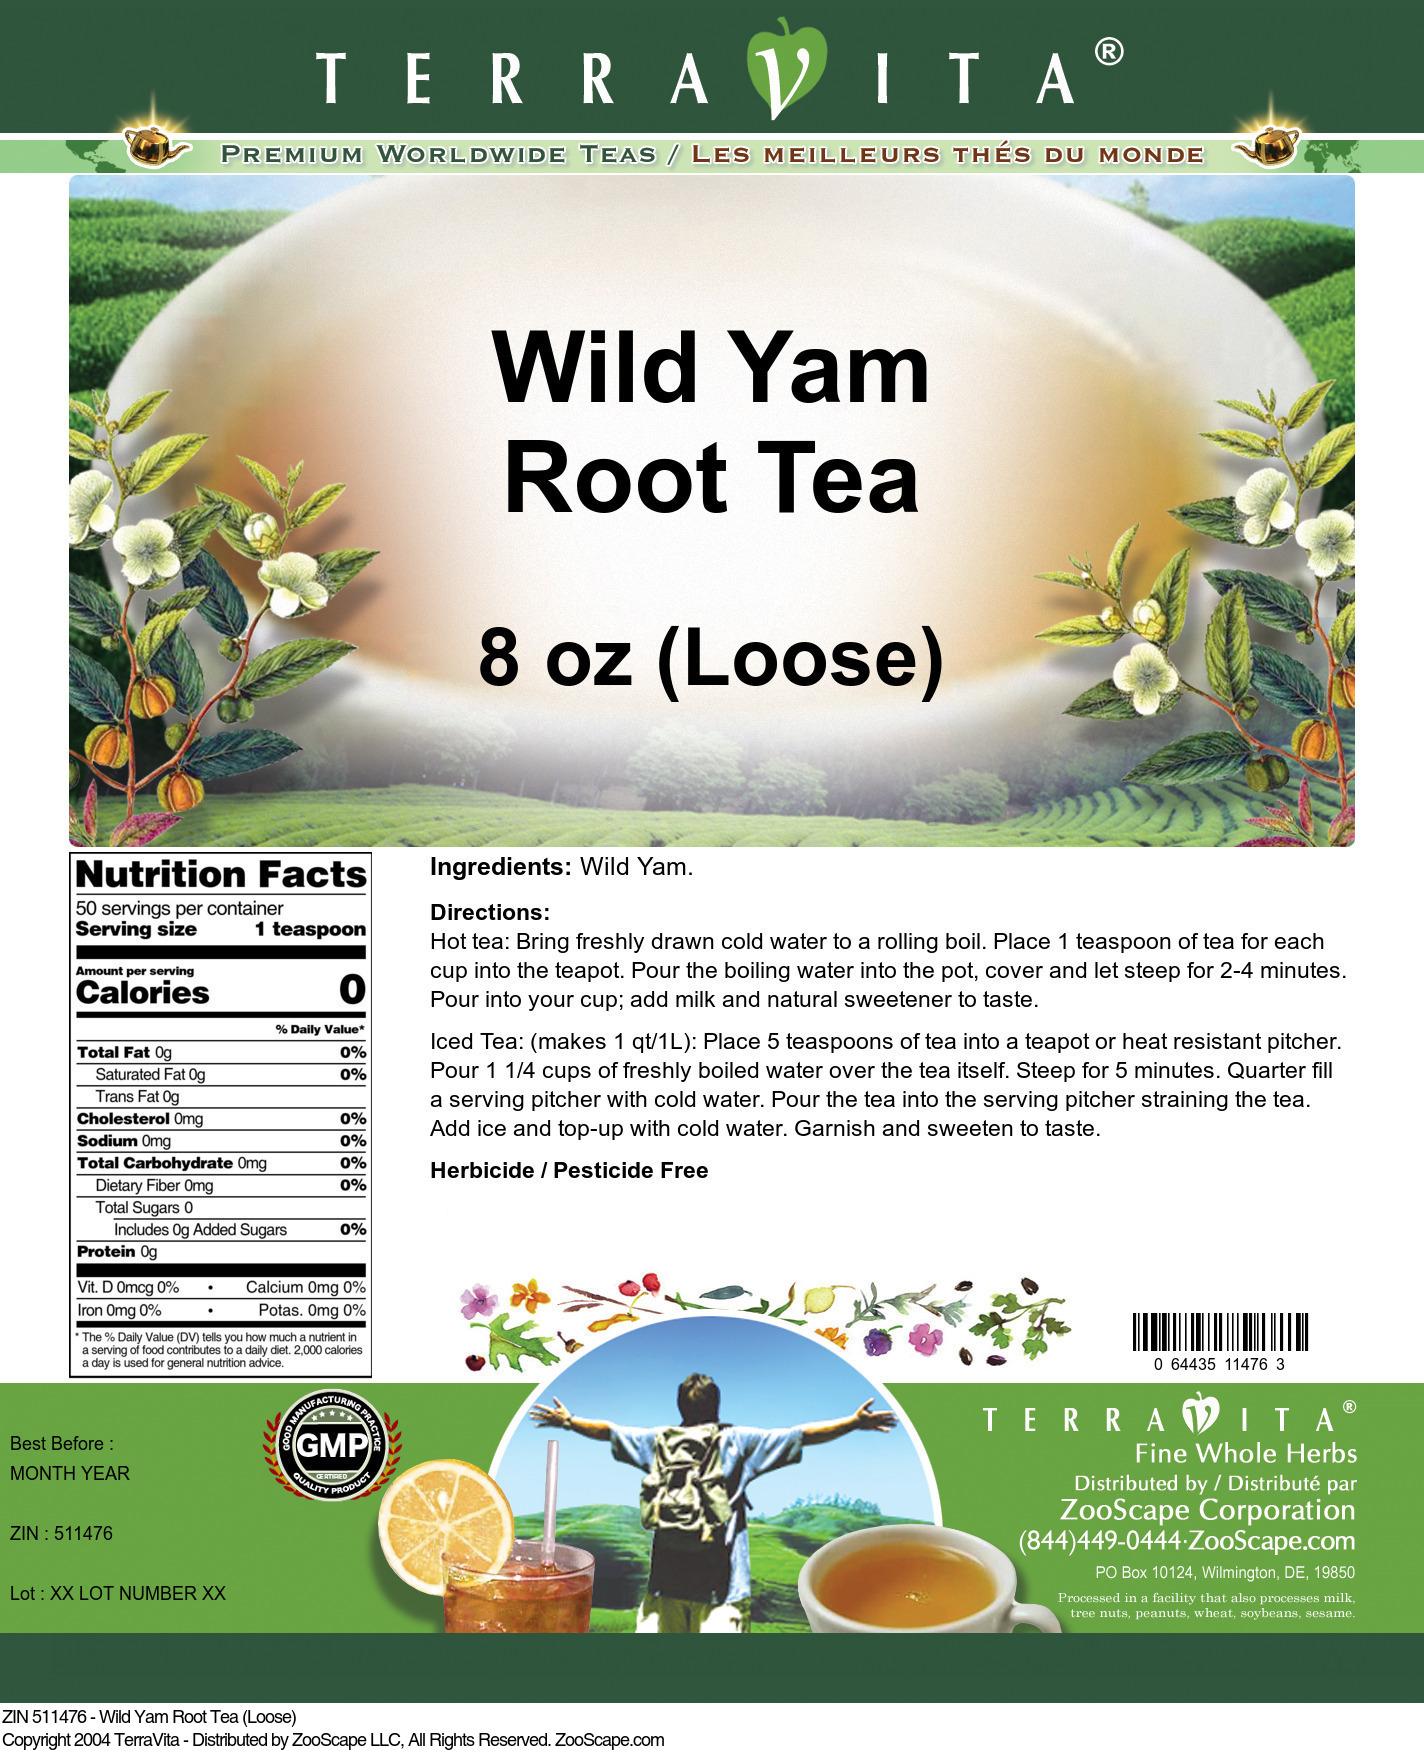 Wild Yam Root Tea (Loose)